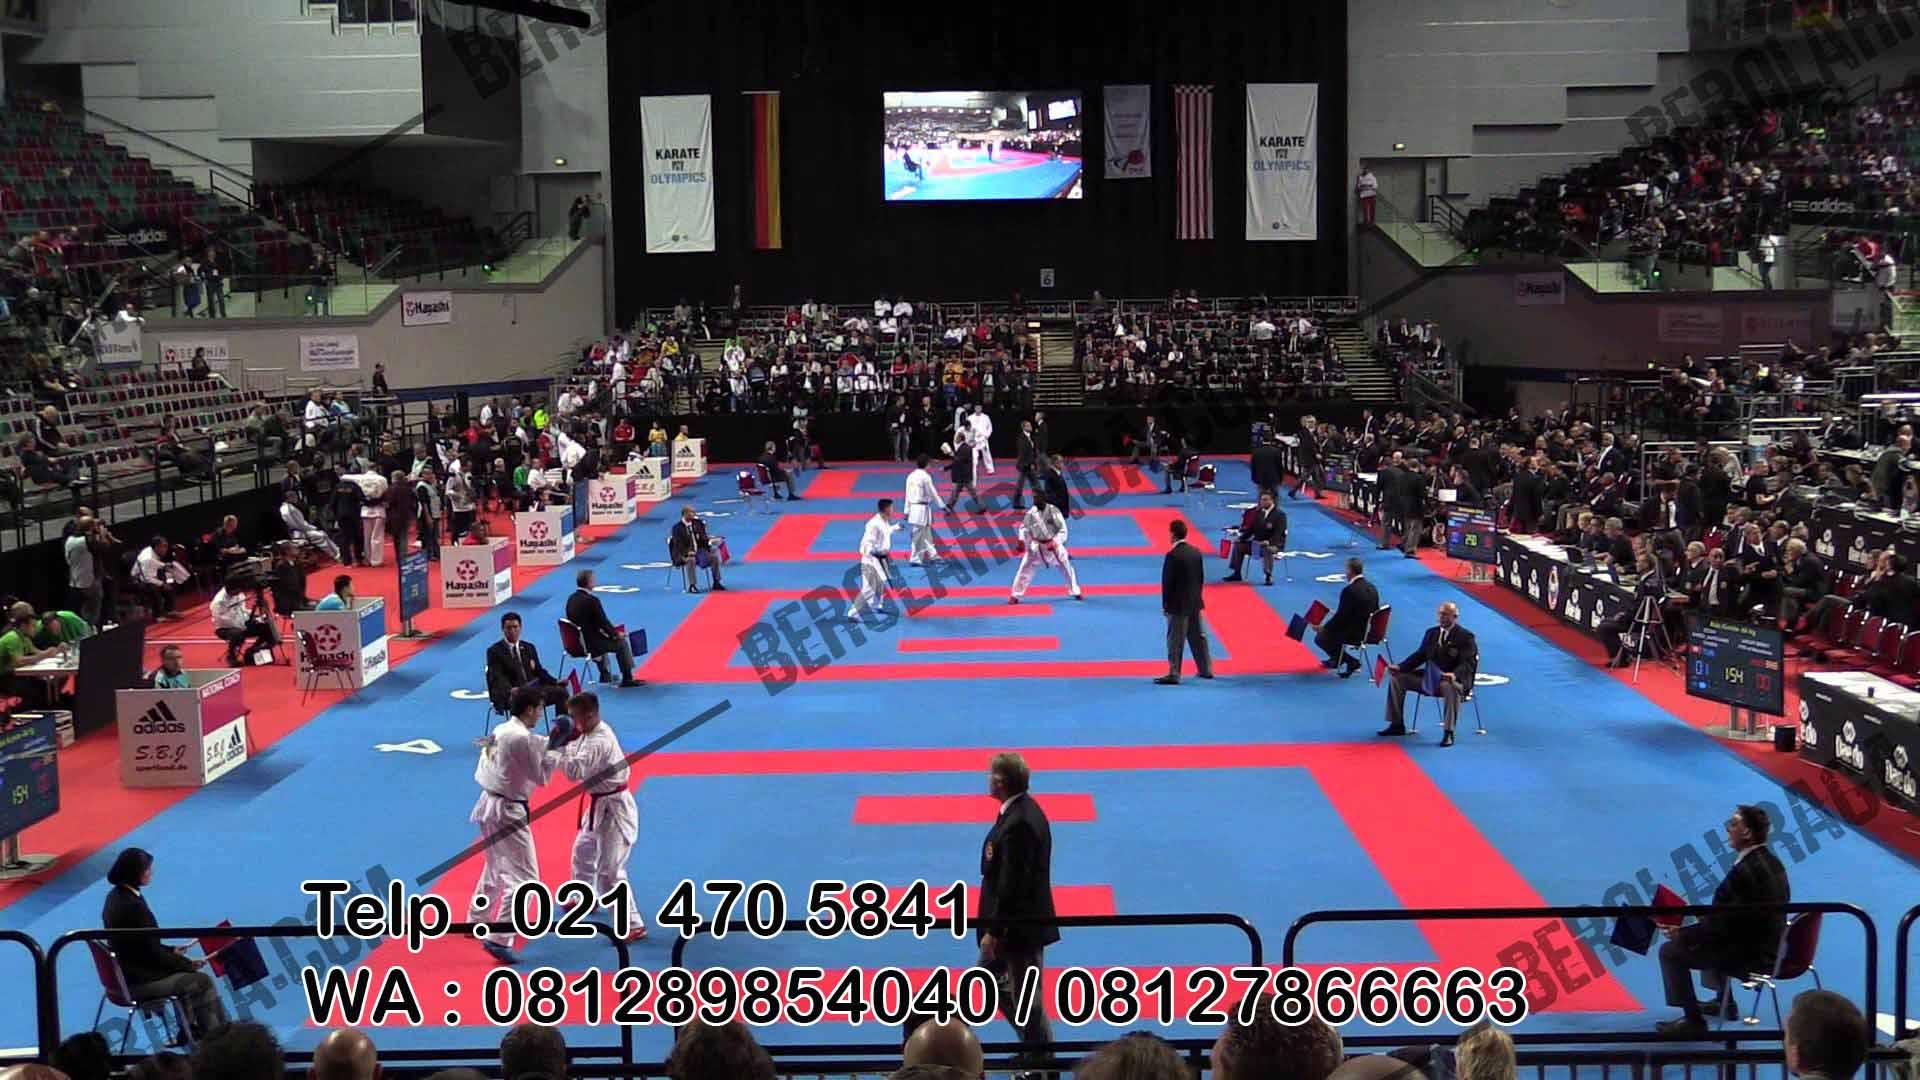 Matras Karate Harga grosir di Jakarta, Kualitas standard kompetisi, shipping ke seleruh wilayah Indonesia, harga paling murah grossir